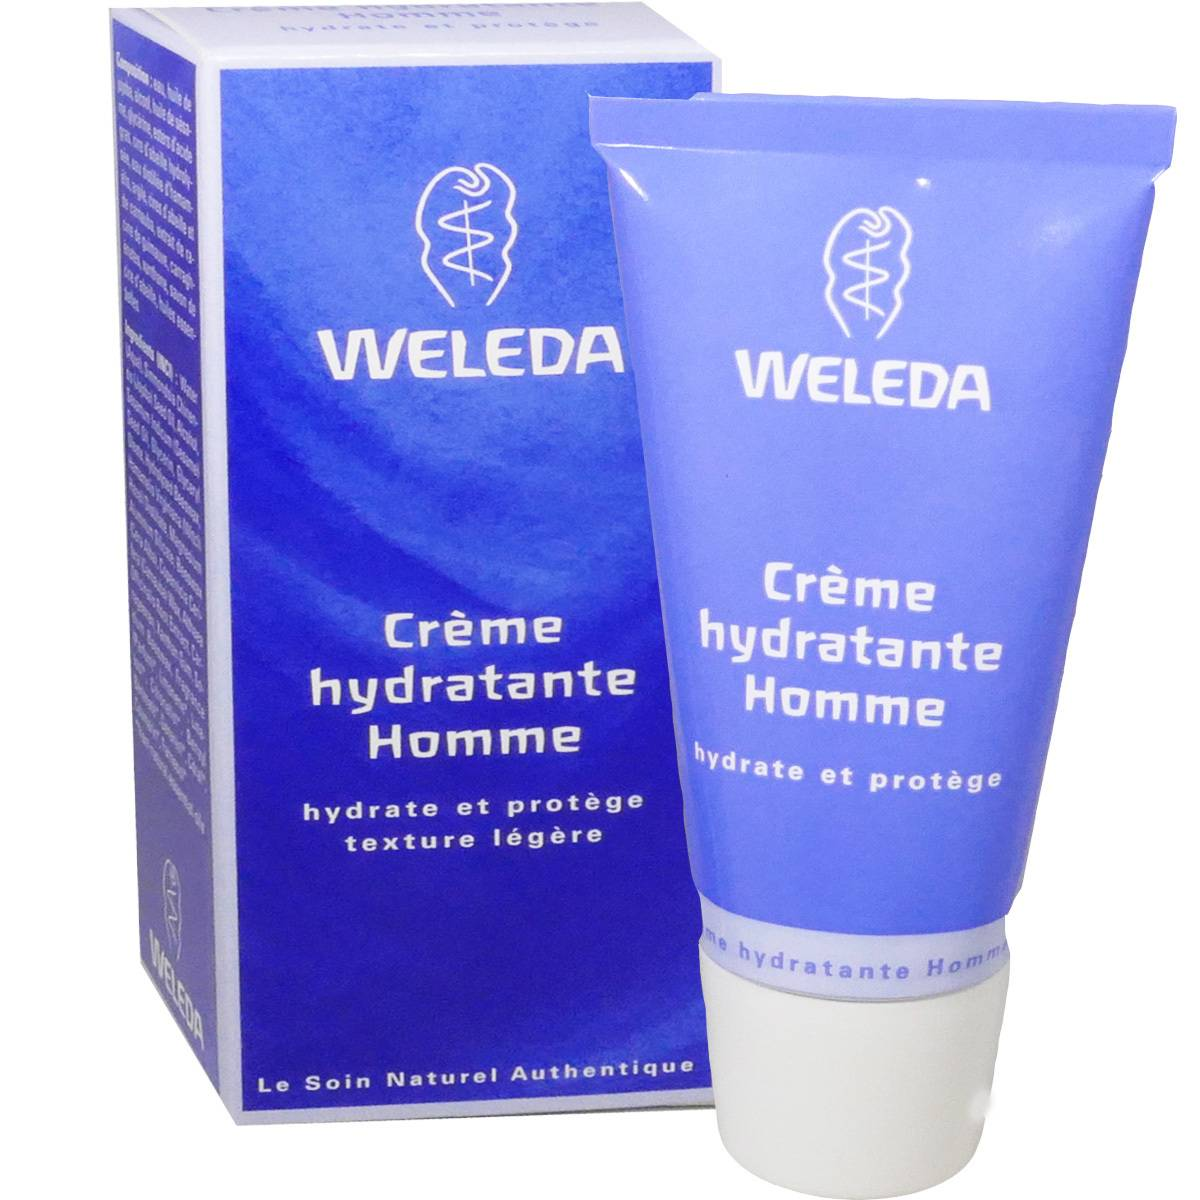 Weleda creme hydratante homme 30 ml